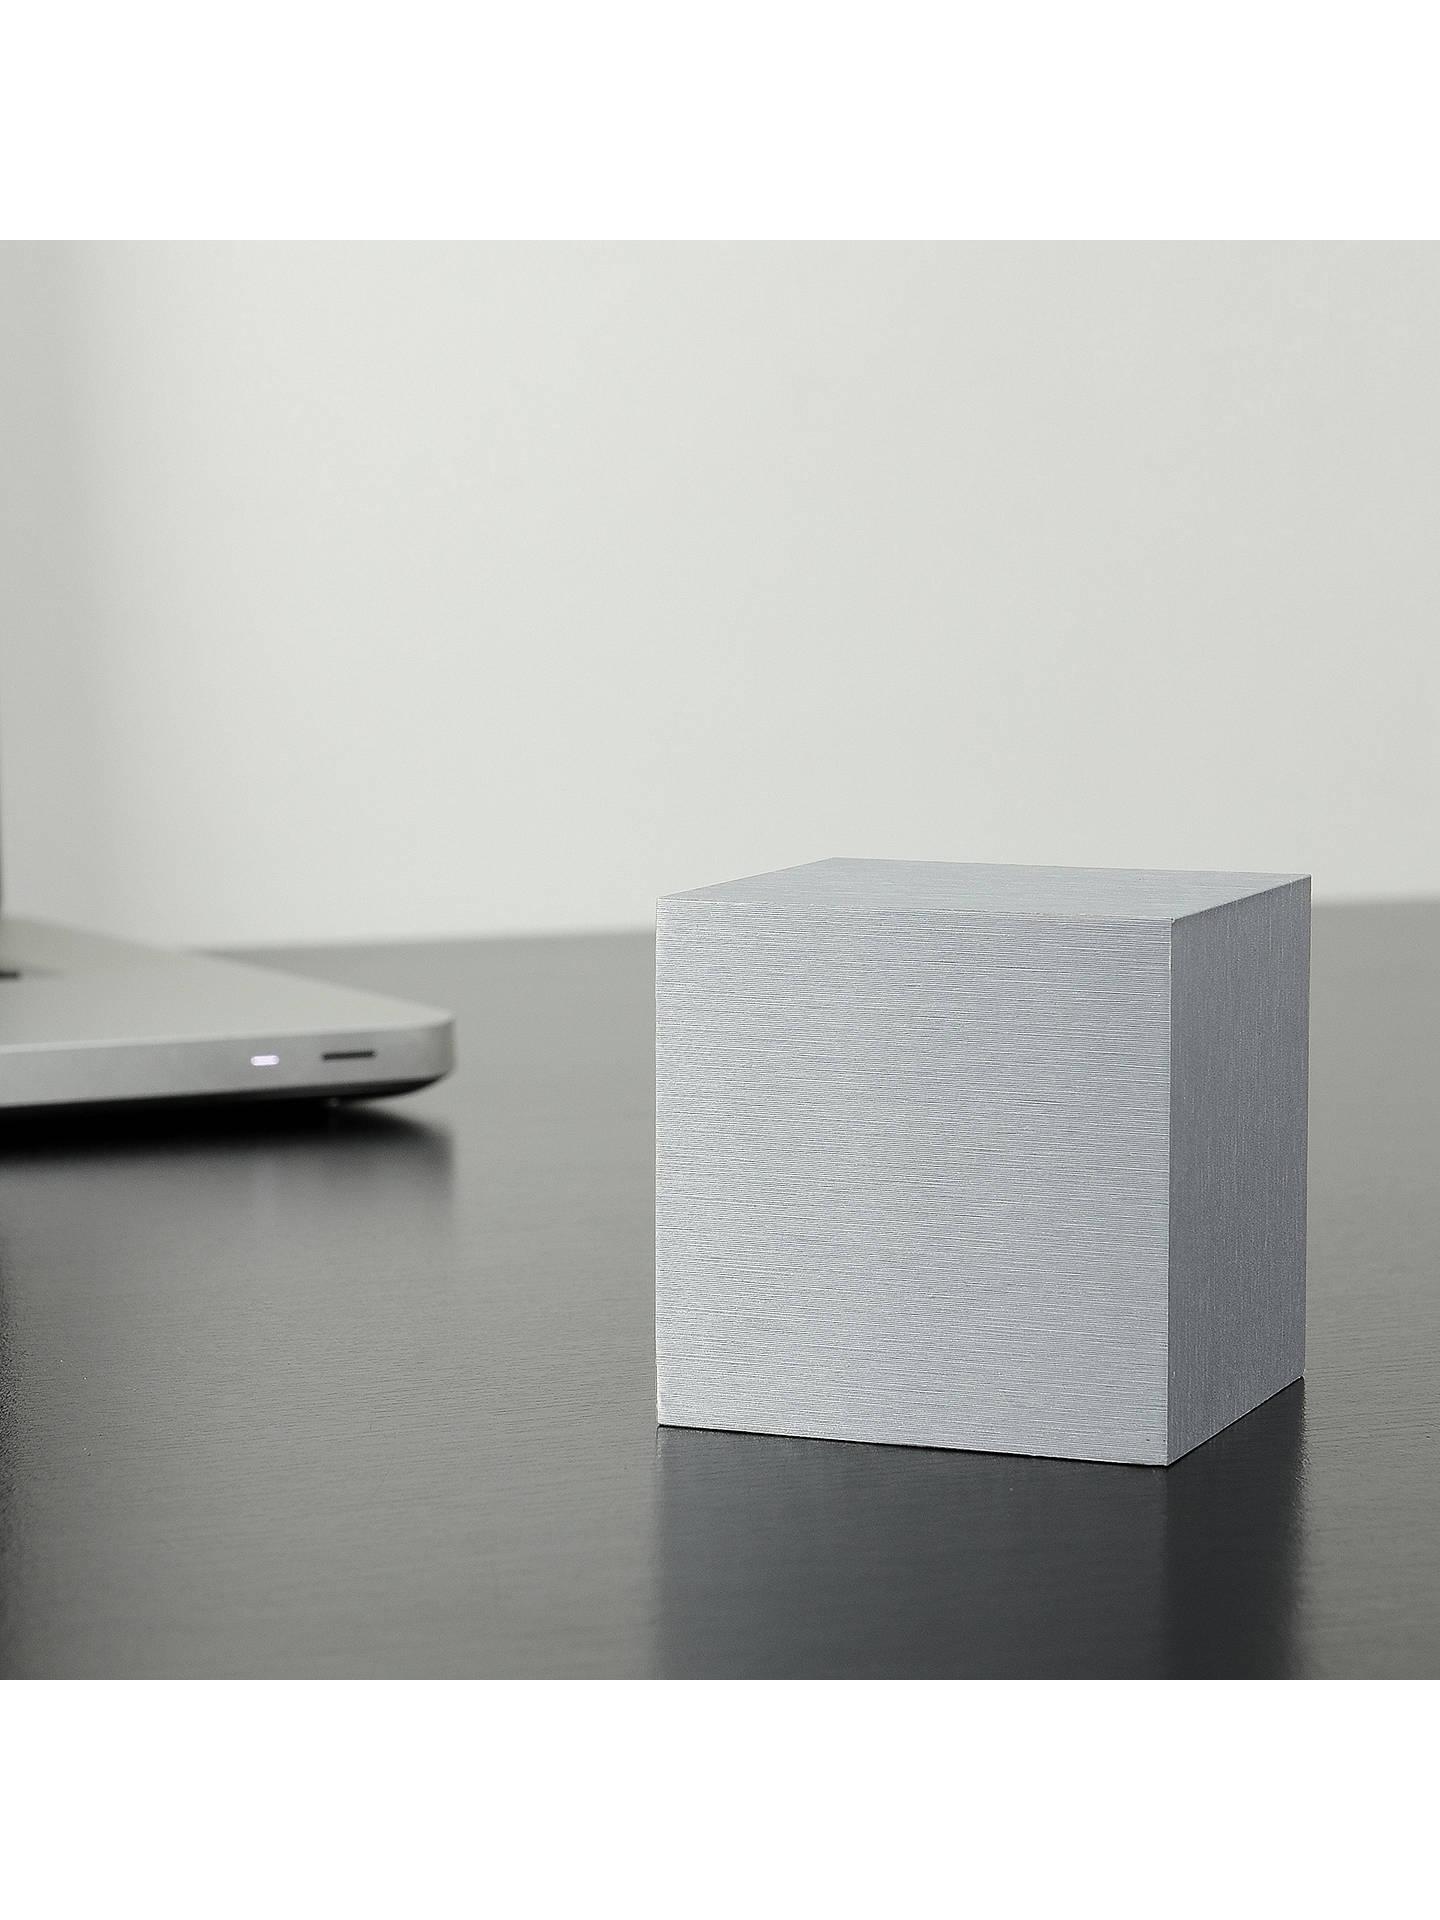 Gingko Click Clock Cube Led Alarm Clock At John Lewis